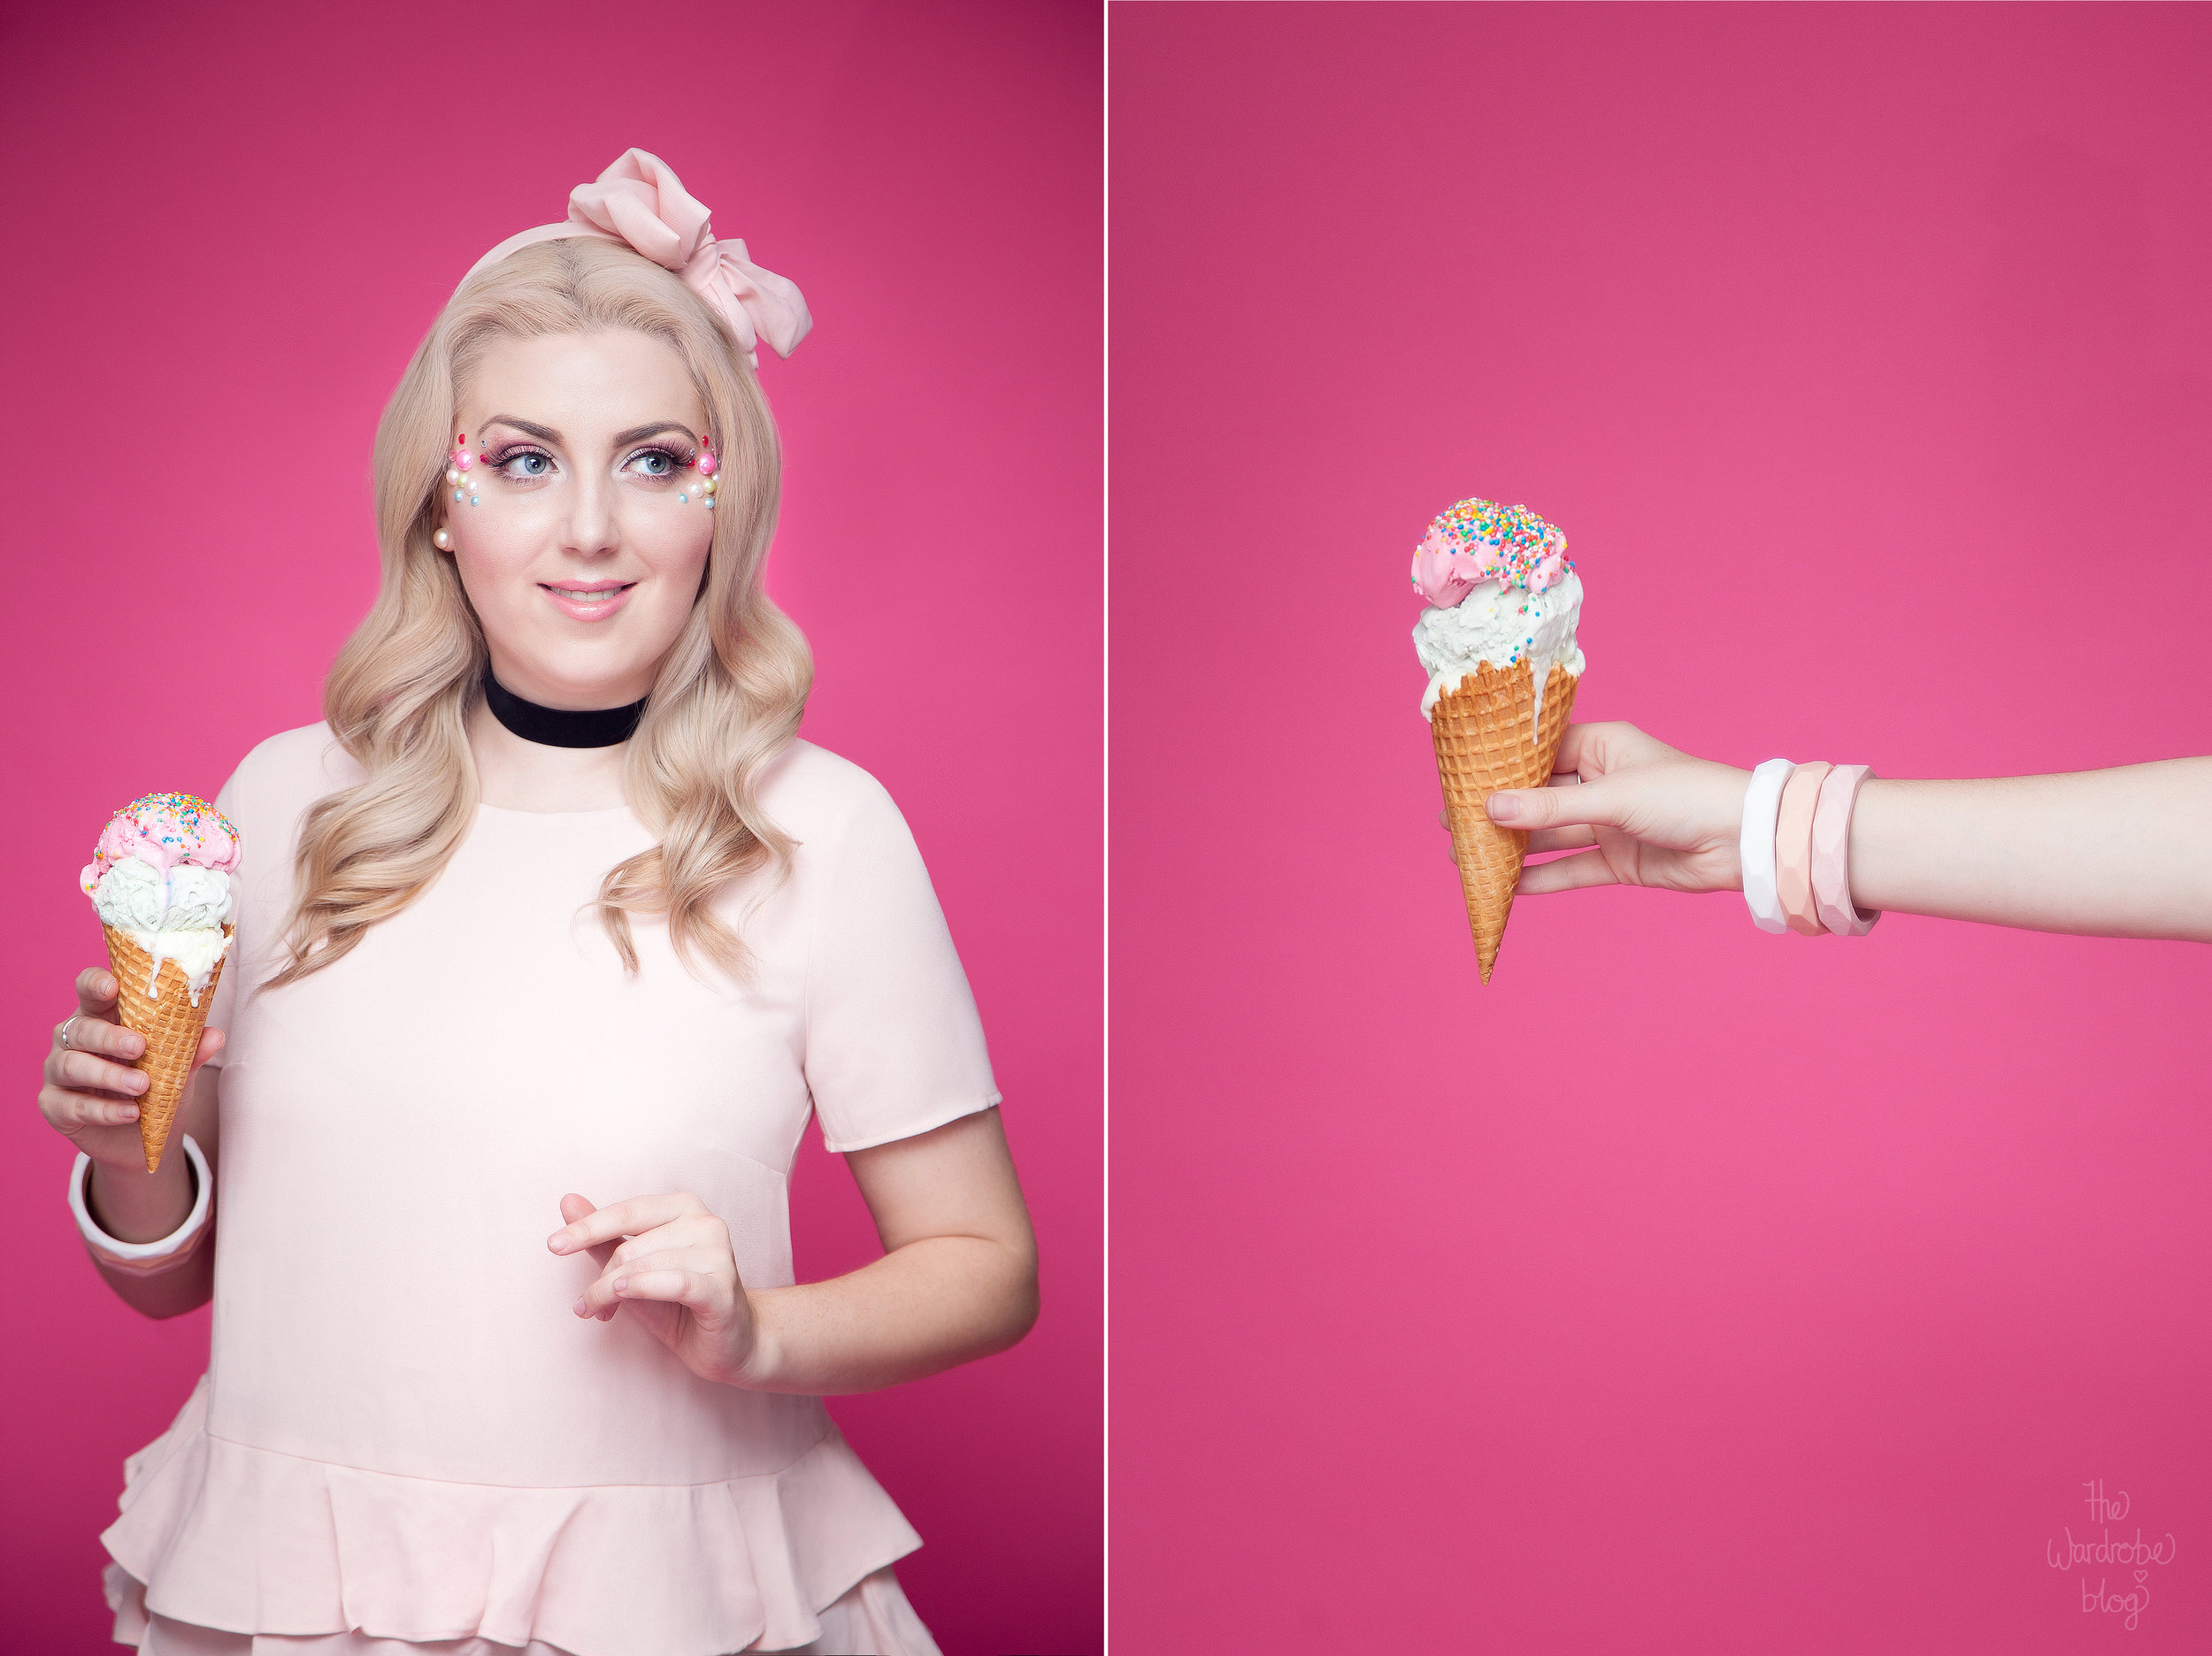 Icecream-Pair-Kmart-Blouse-Pink-Ruffle